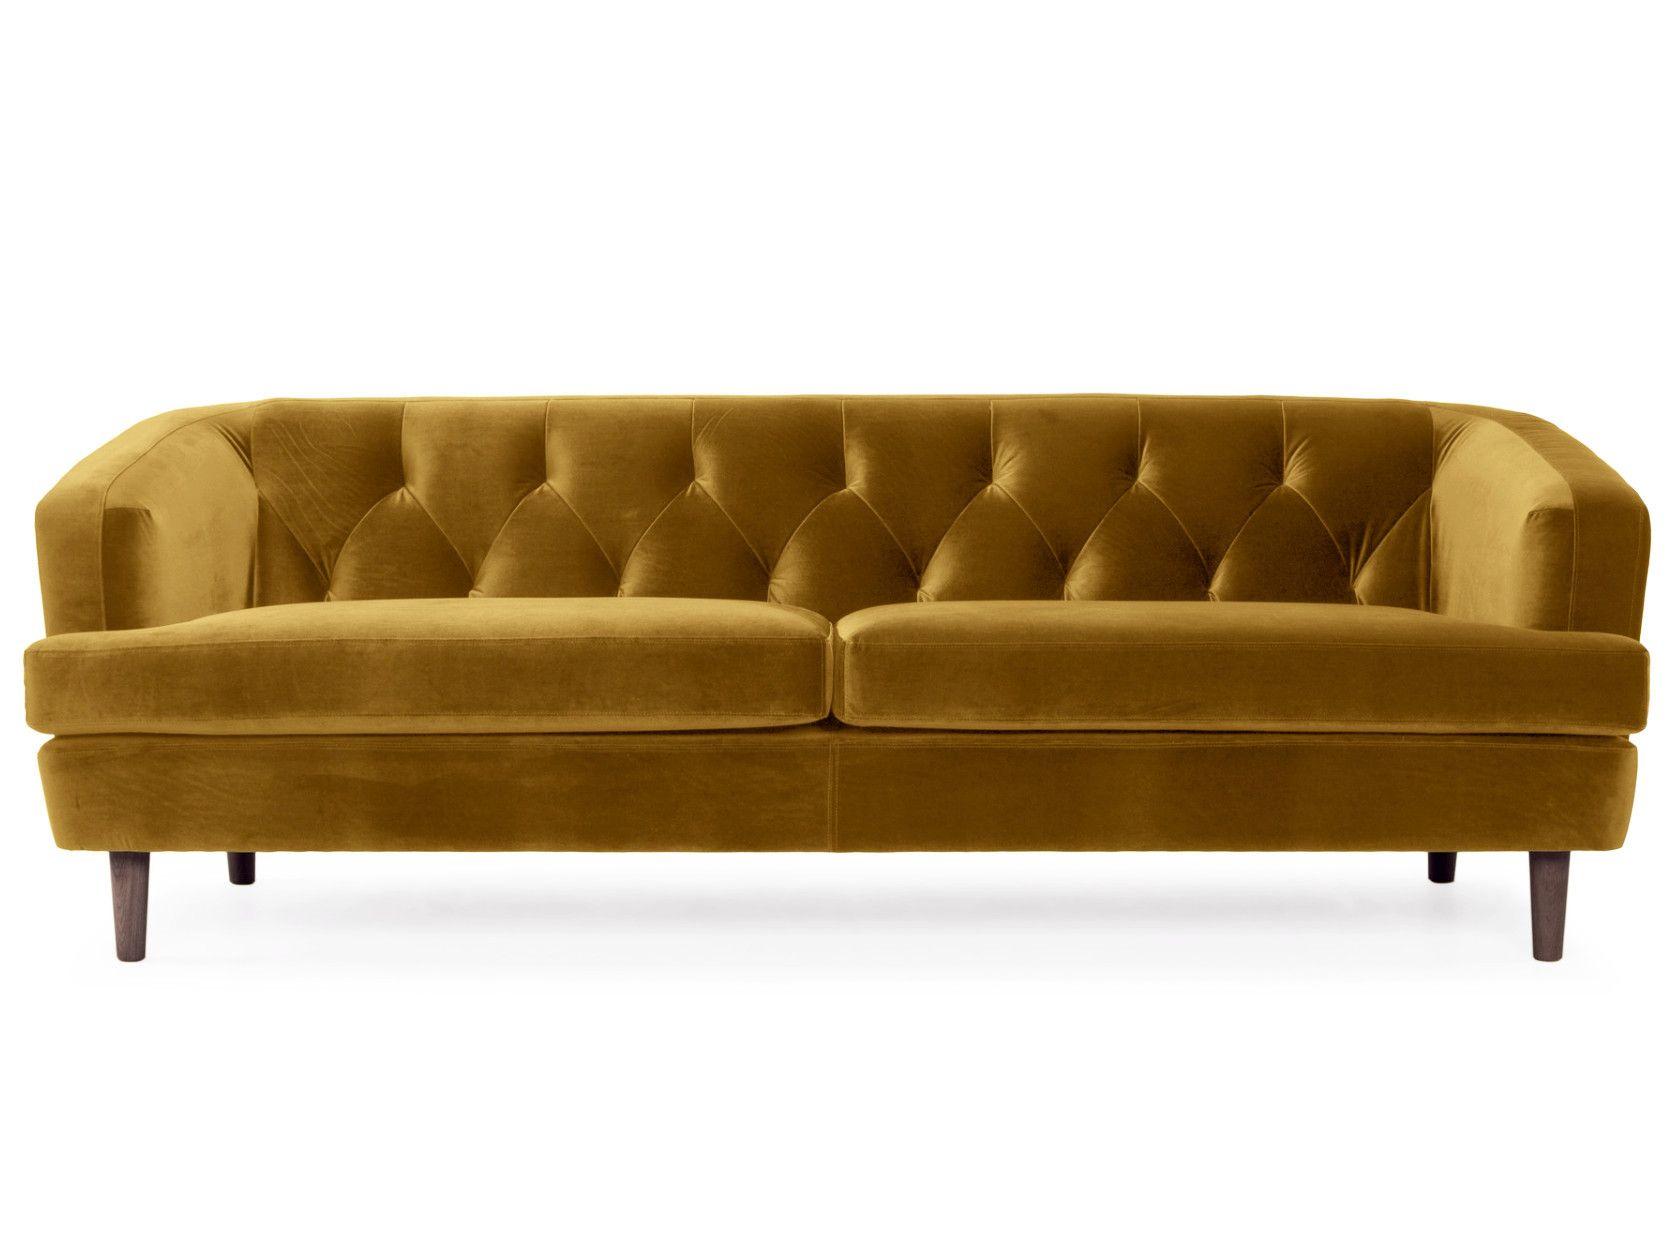 Baxter 3 Seater Velvet Sofa Deep Mustard – Shut the Front Door